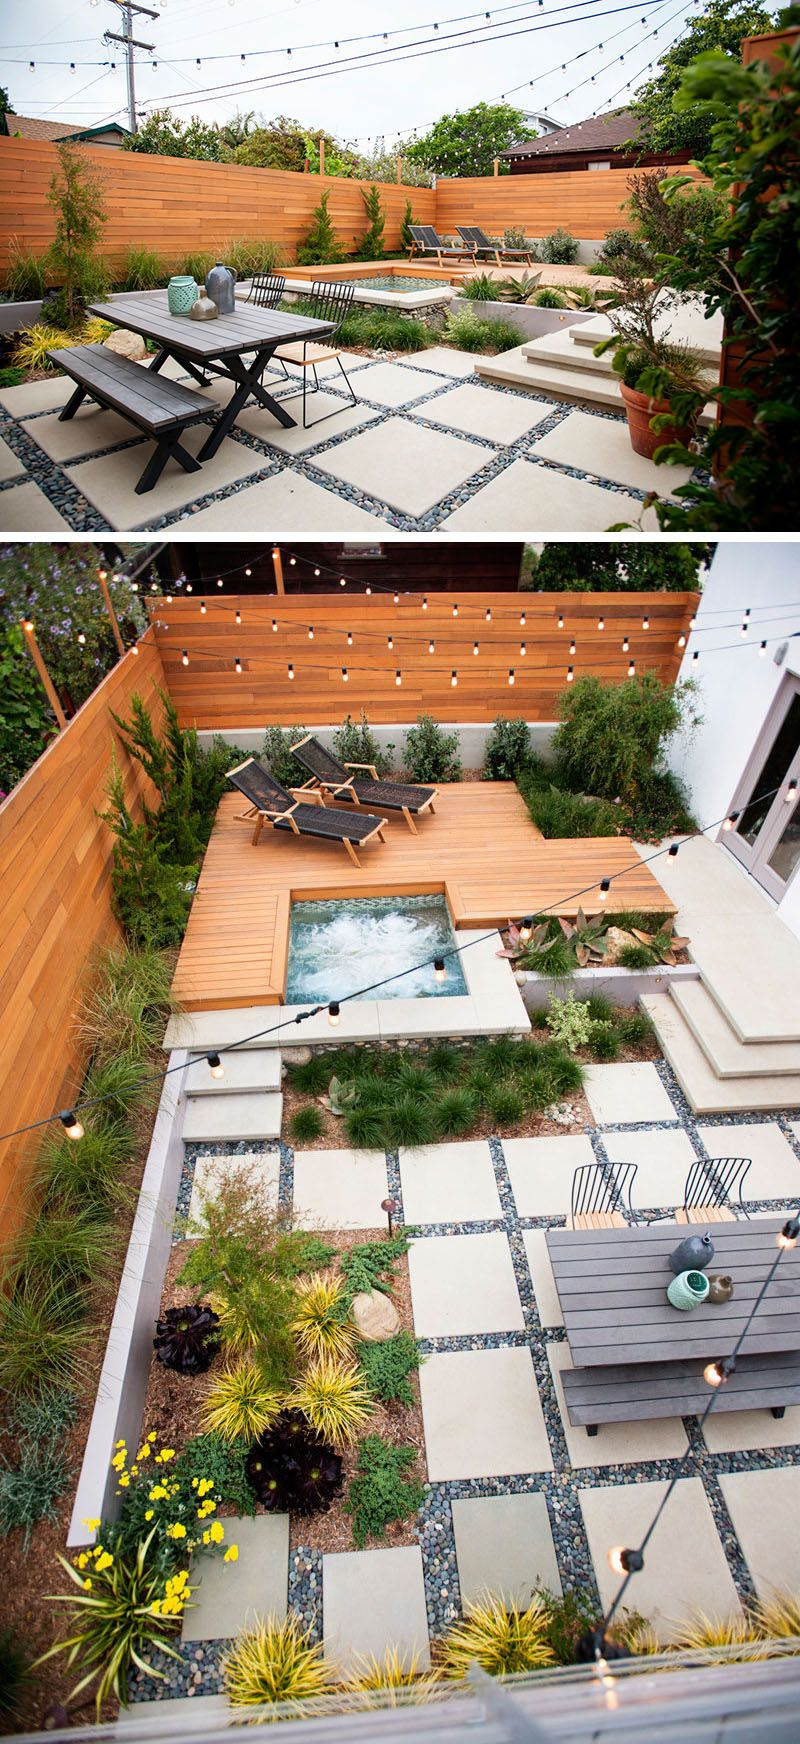 Landscaping Design Ideas 11 Backyards Designed For Entertaining Backyard Landscaping Designs Small Backyard Landscaping Backyard